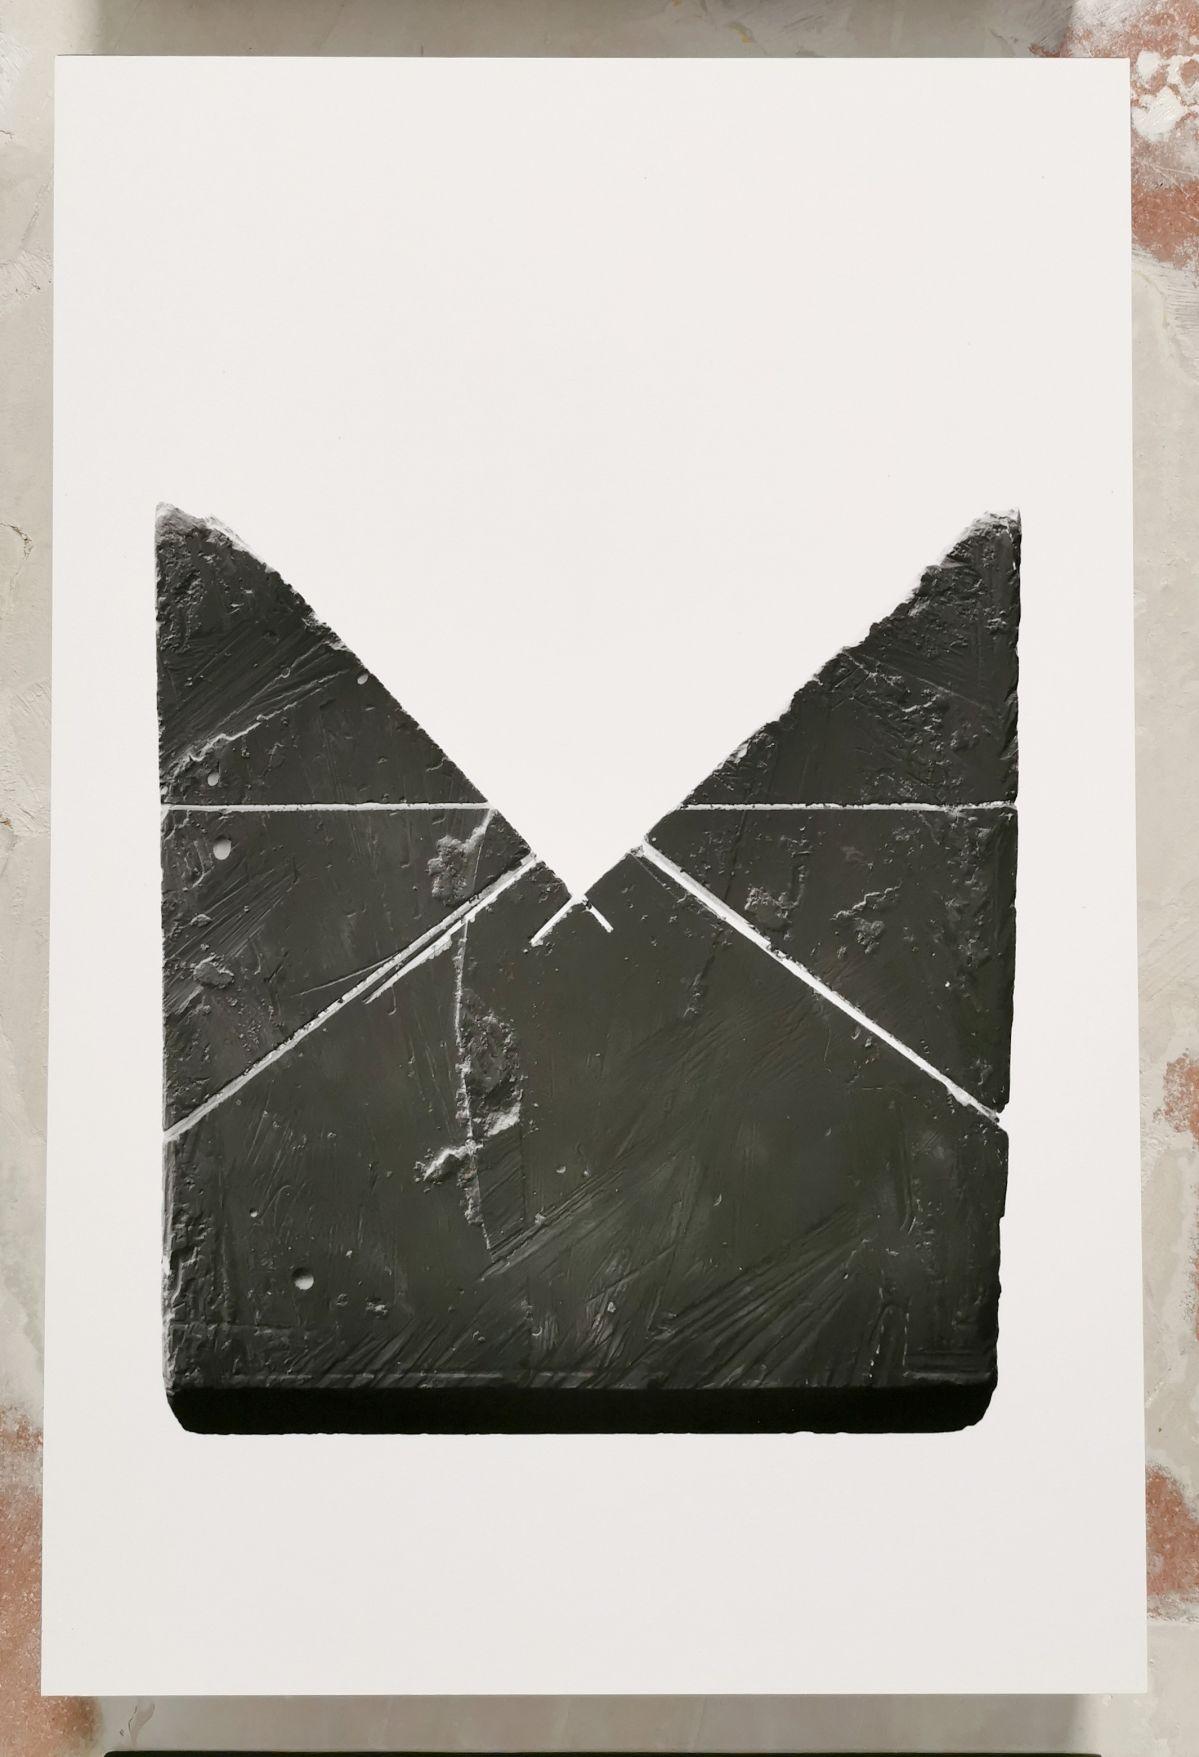 Gilles Pourtier - Black bloc # 1 à 20, 2020 - «Does the angle between two walls have a happy ending» 27 et 33 rue St Jacques - PAC 2020 - Marseille